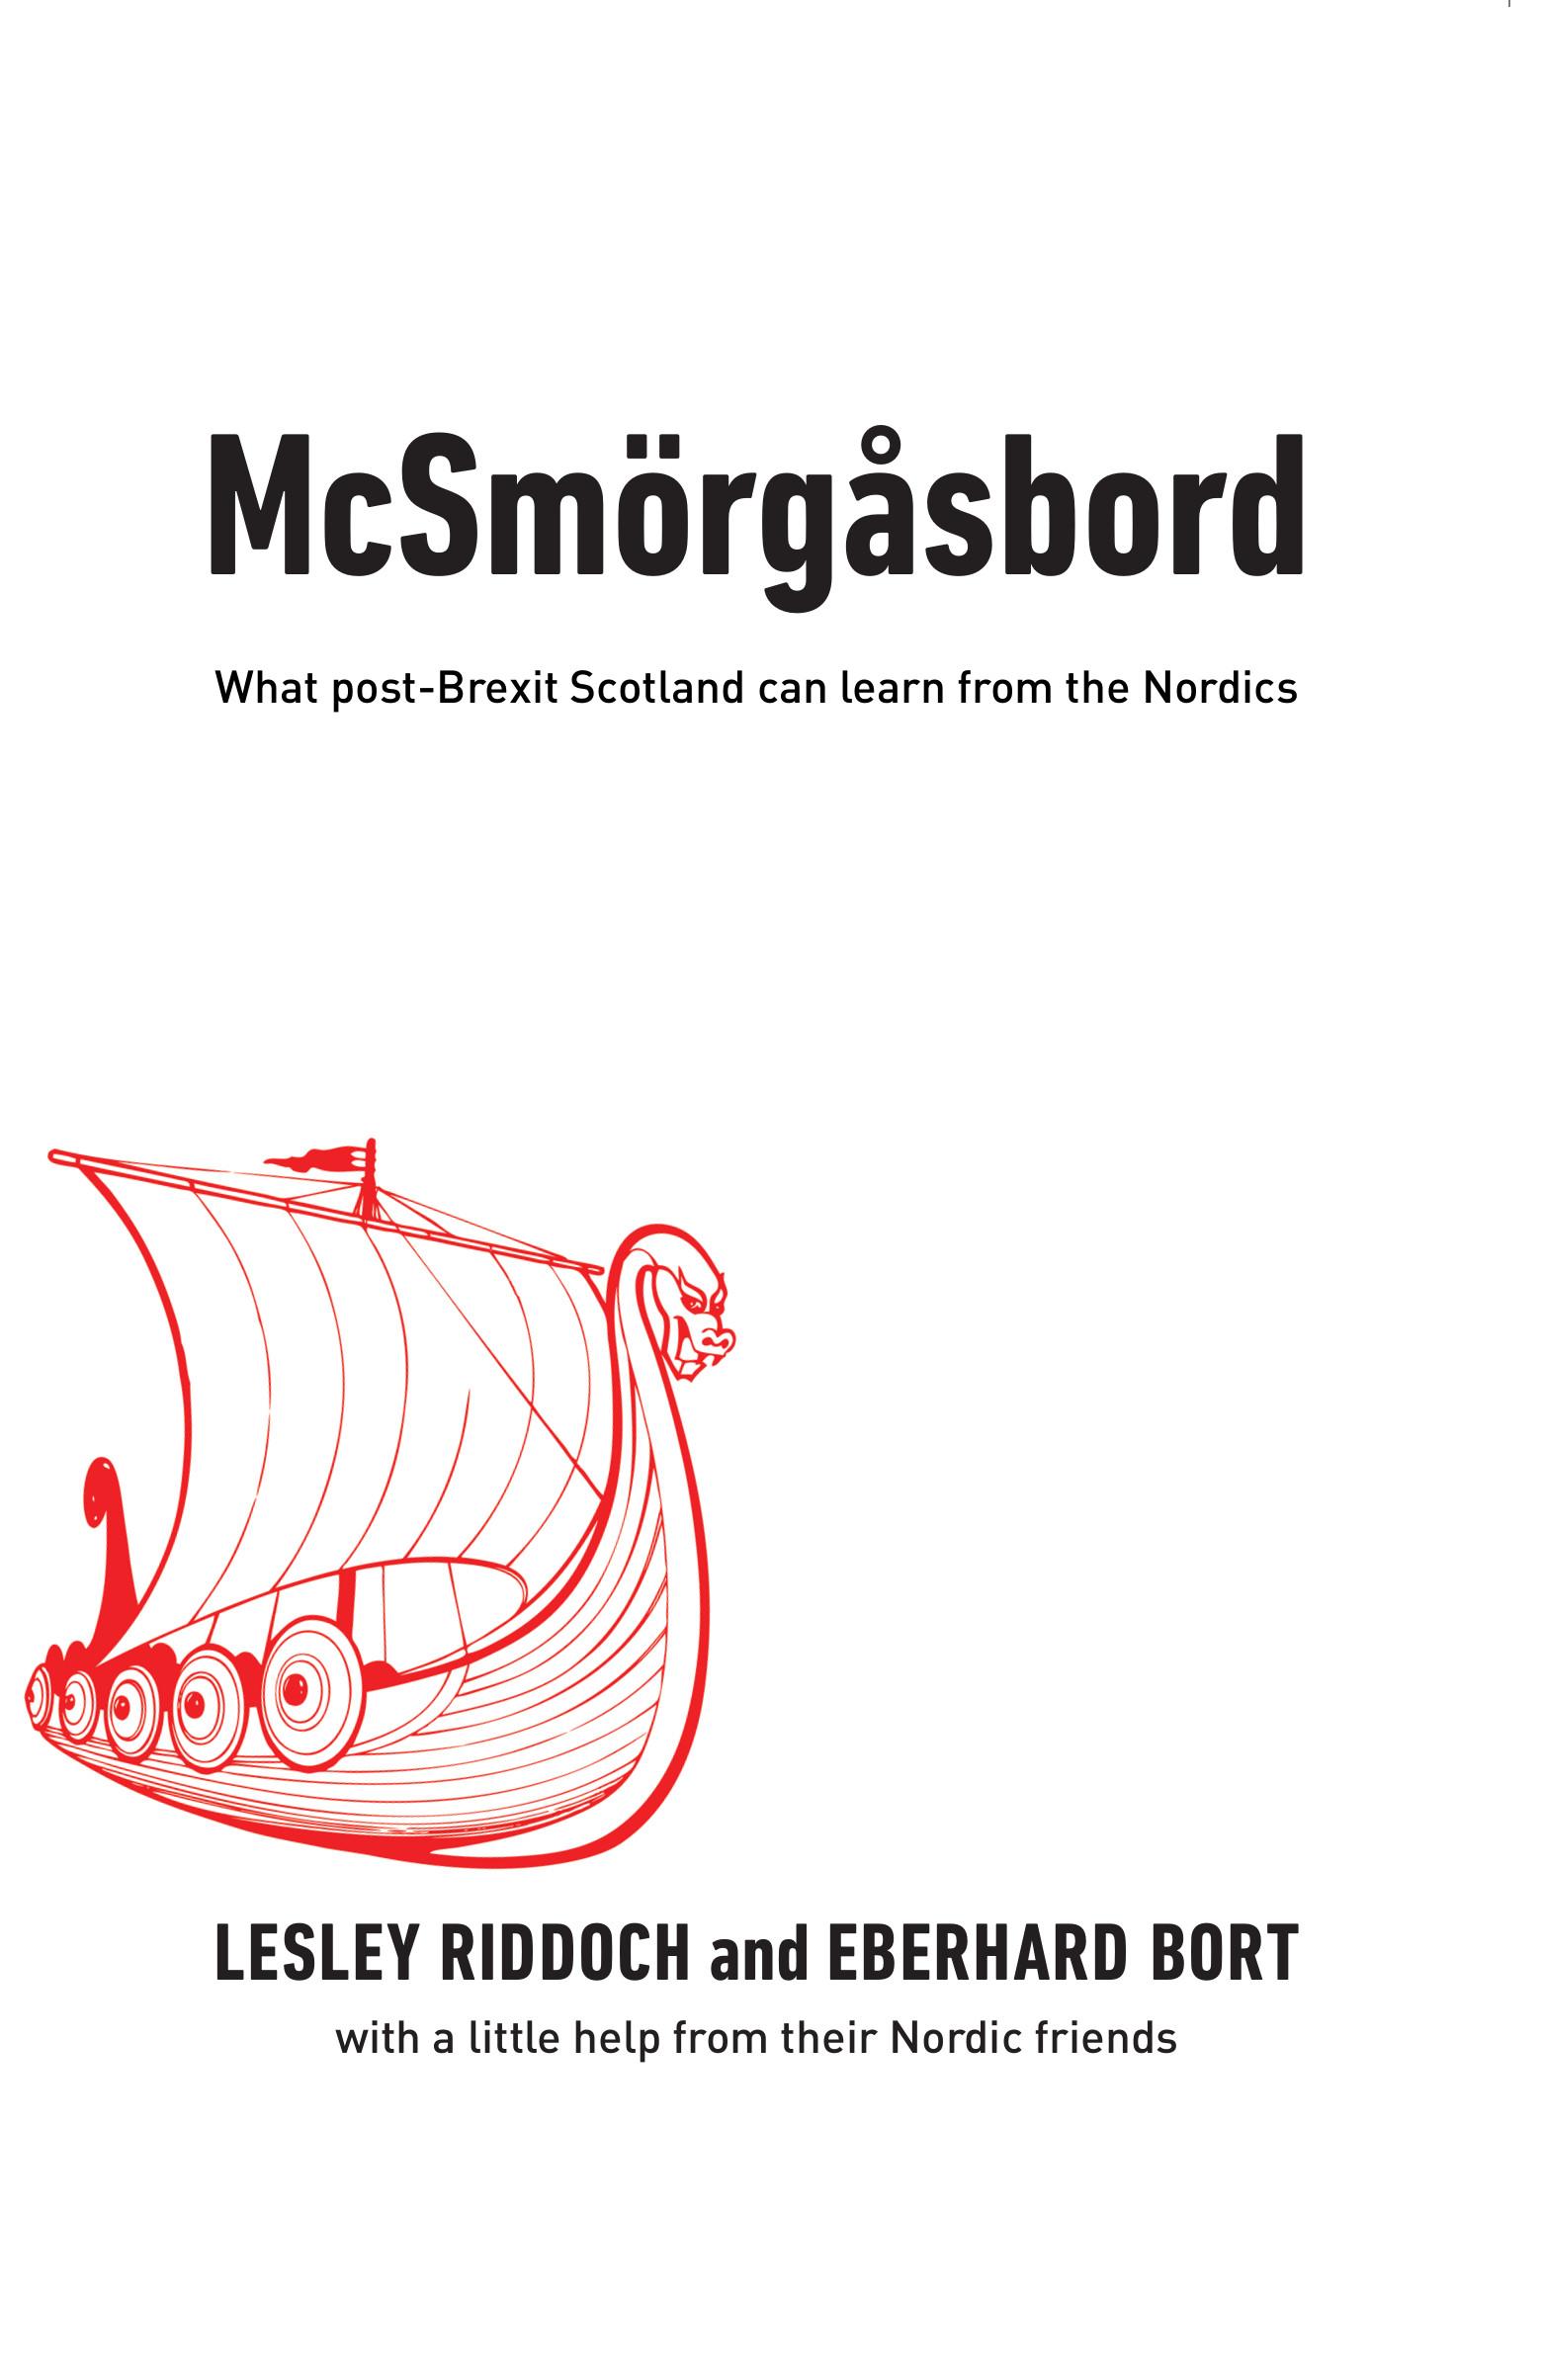 McSmörgåsbord: Nordic Post-Brexit Learnings For Scotland